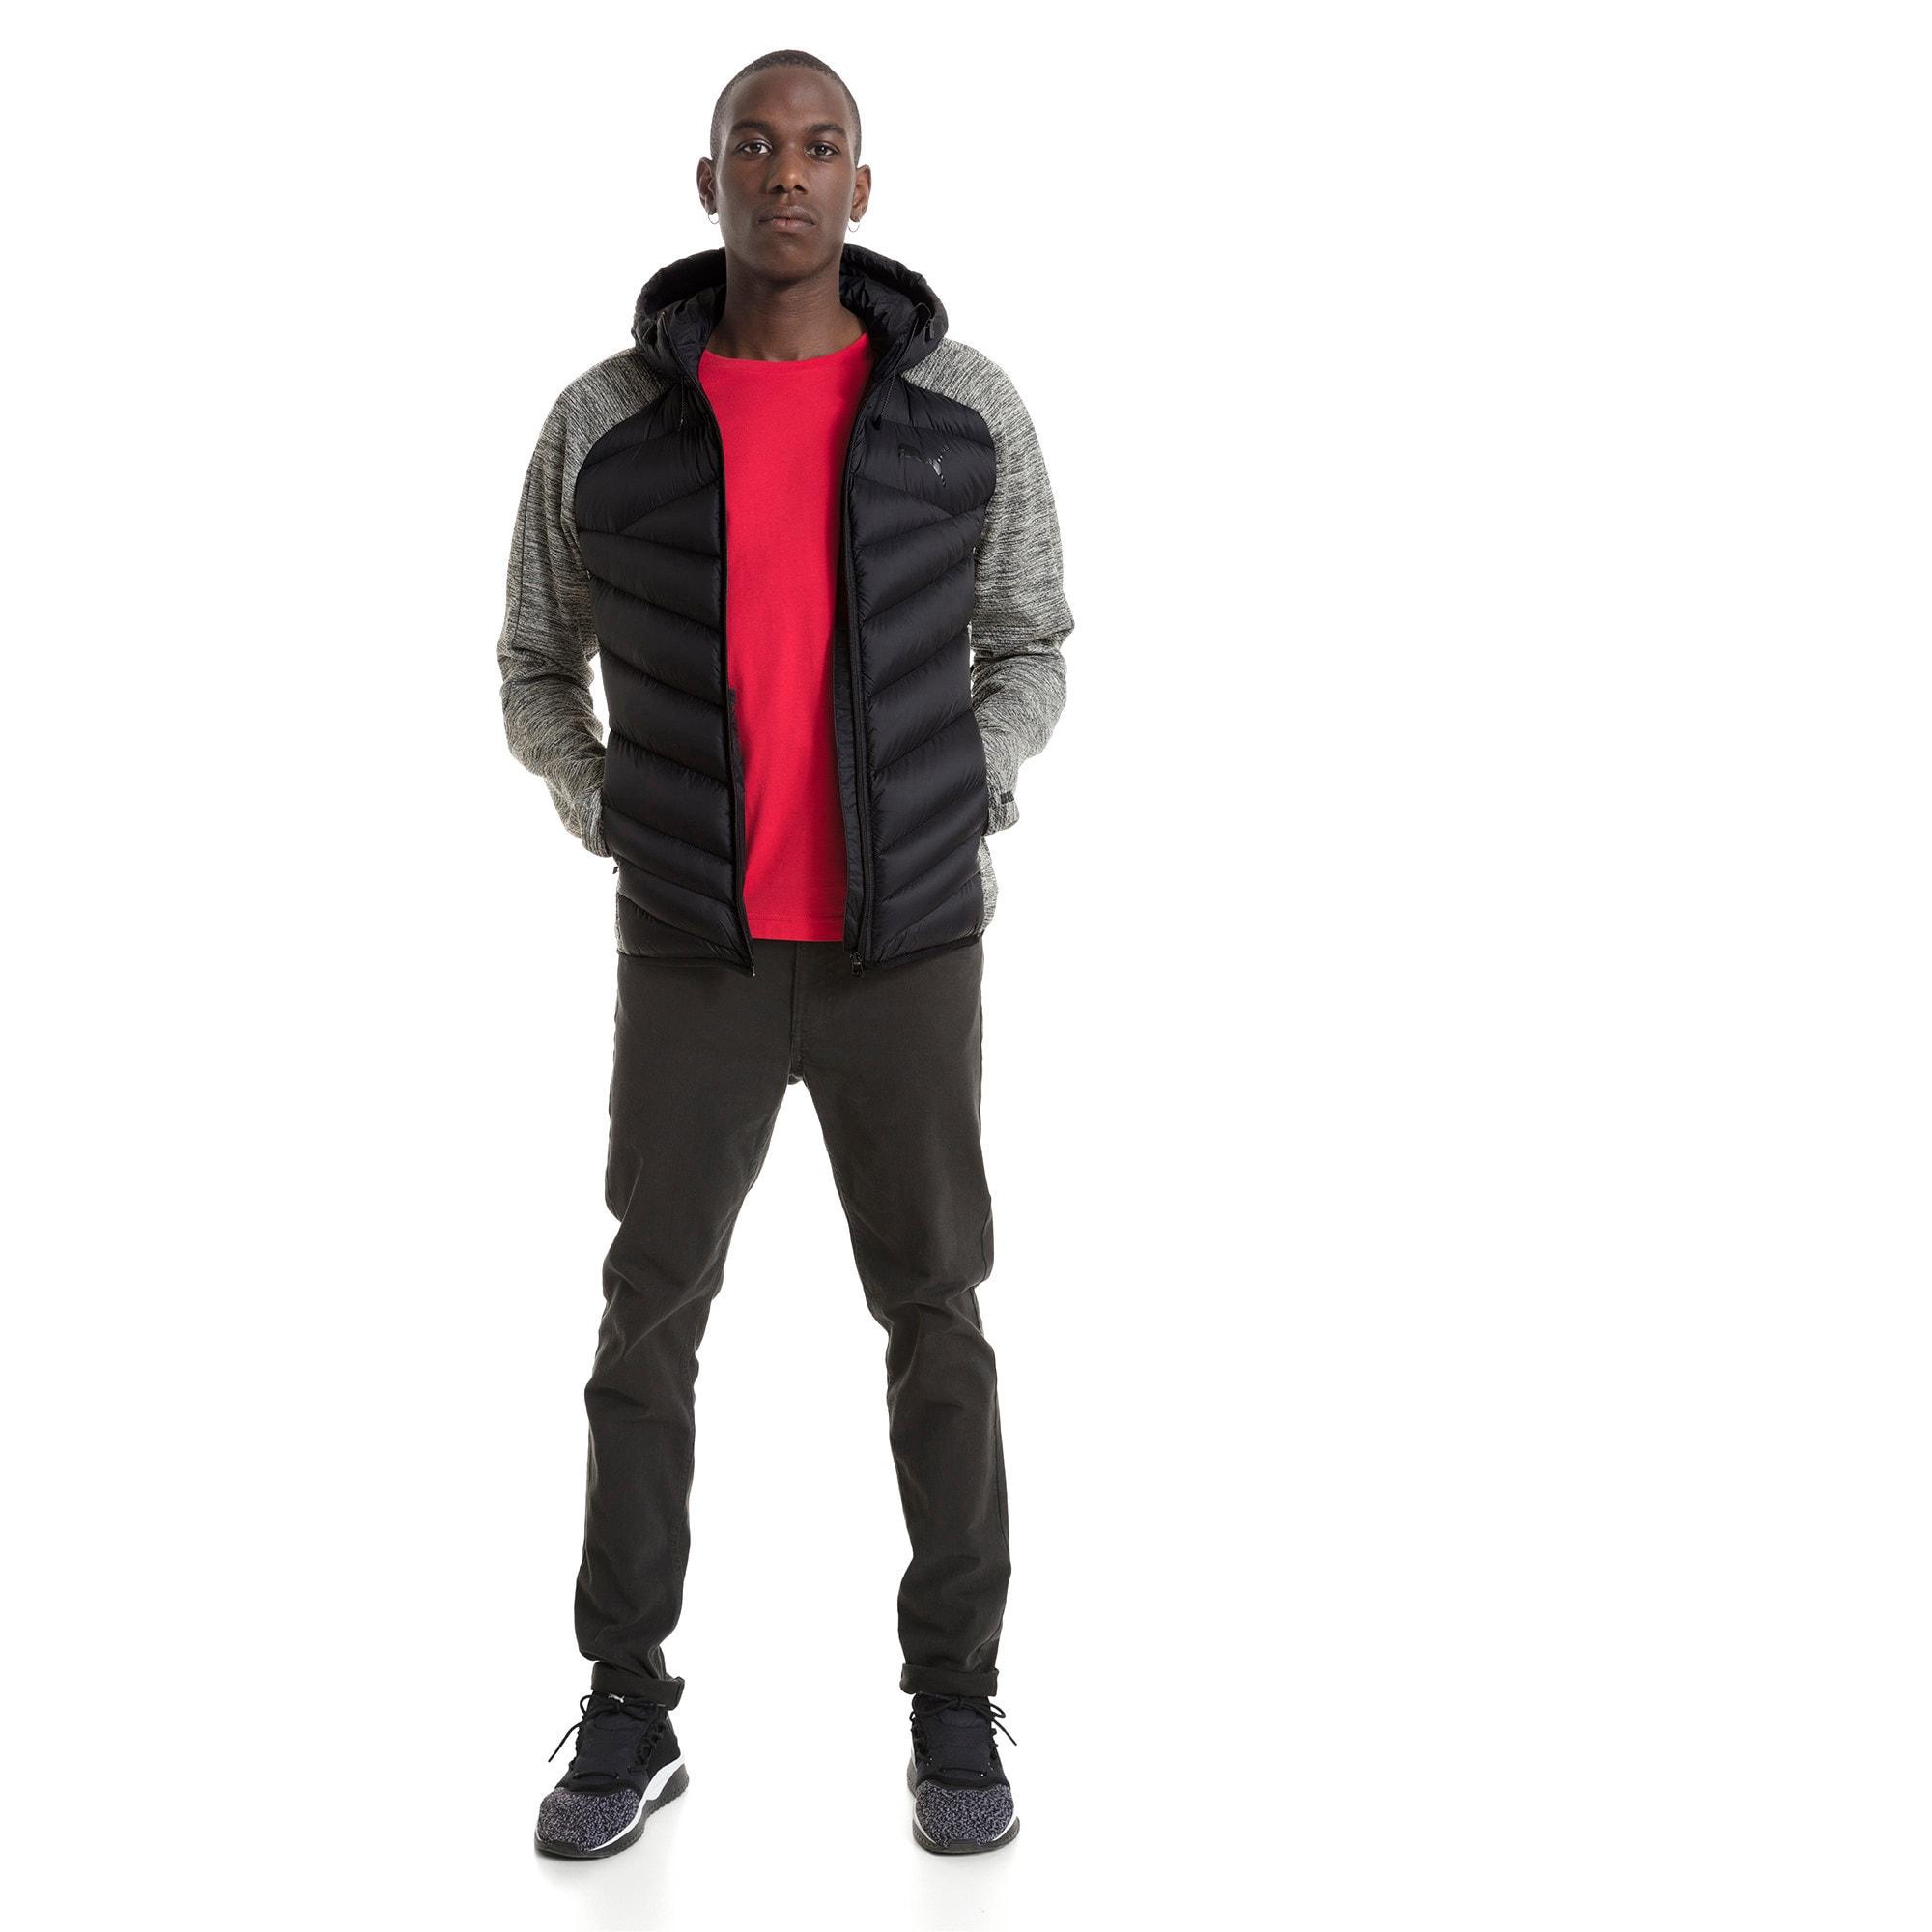 Thumbnail 3 of Double Knit Hybrid 600 Down Men's Jacket, MGH-Puma Black, medium-IND